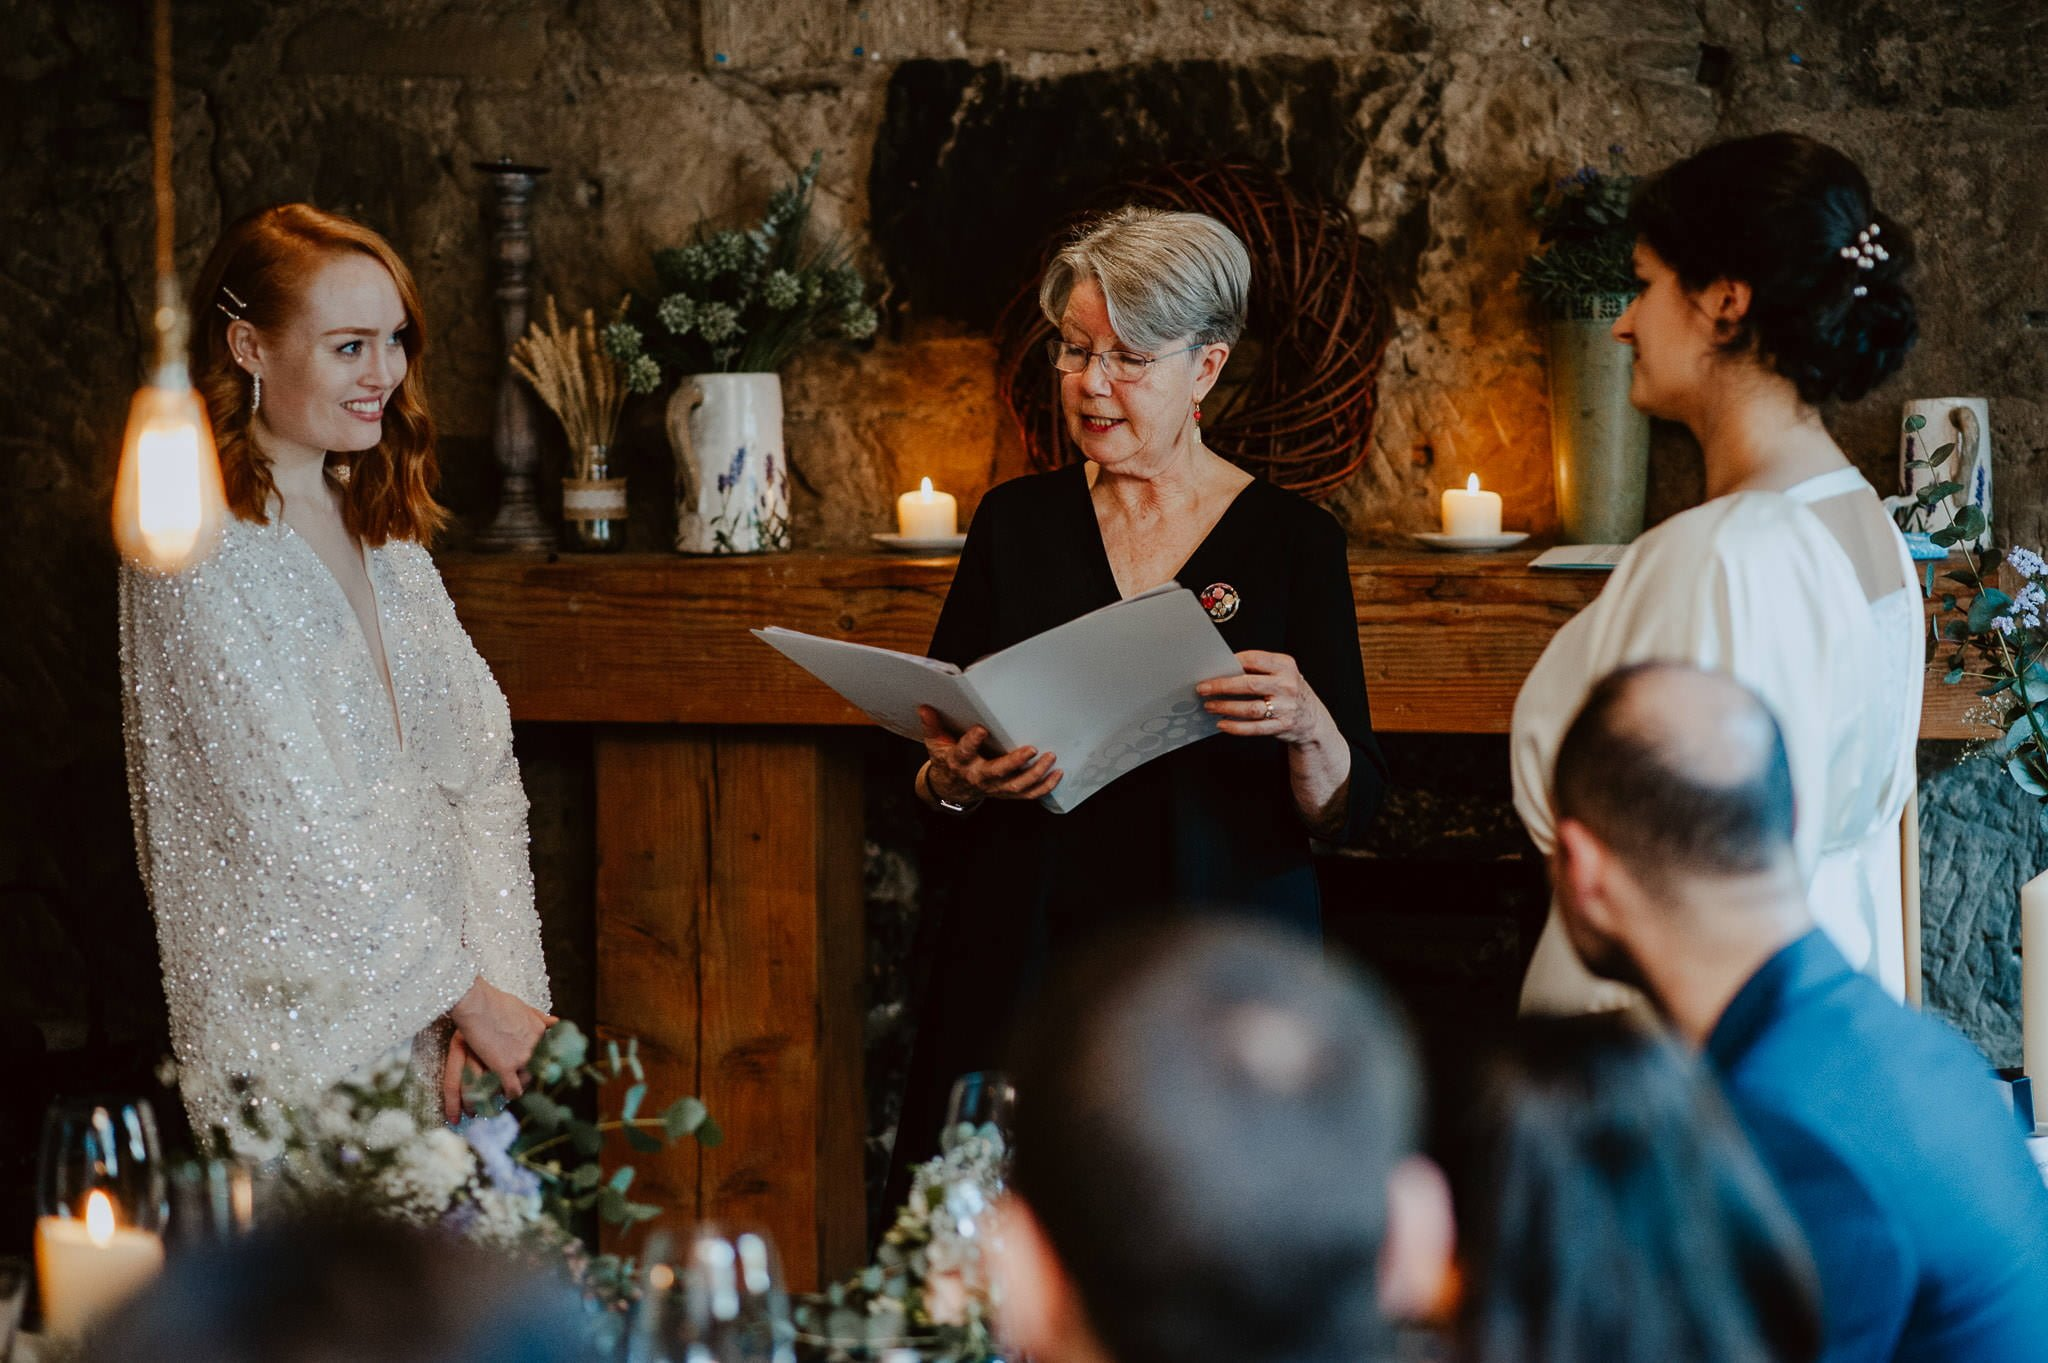 A Dreamy Pre-Raphaelite Wedding at the Bothy in Glasgow 21